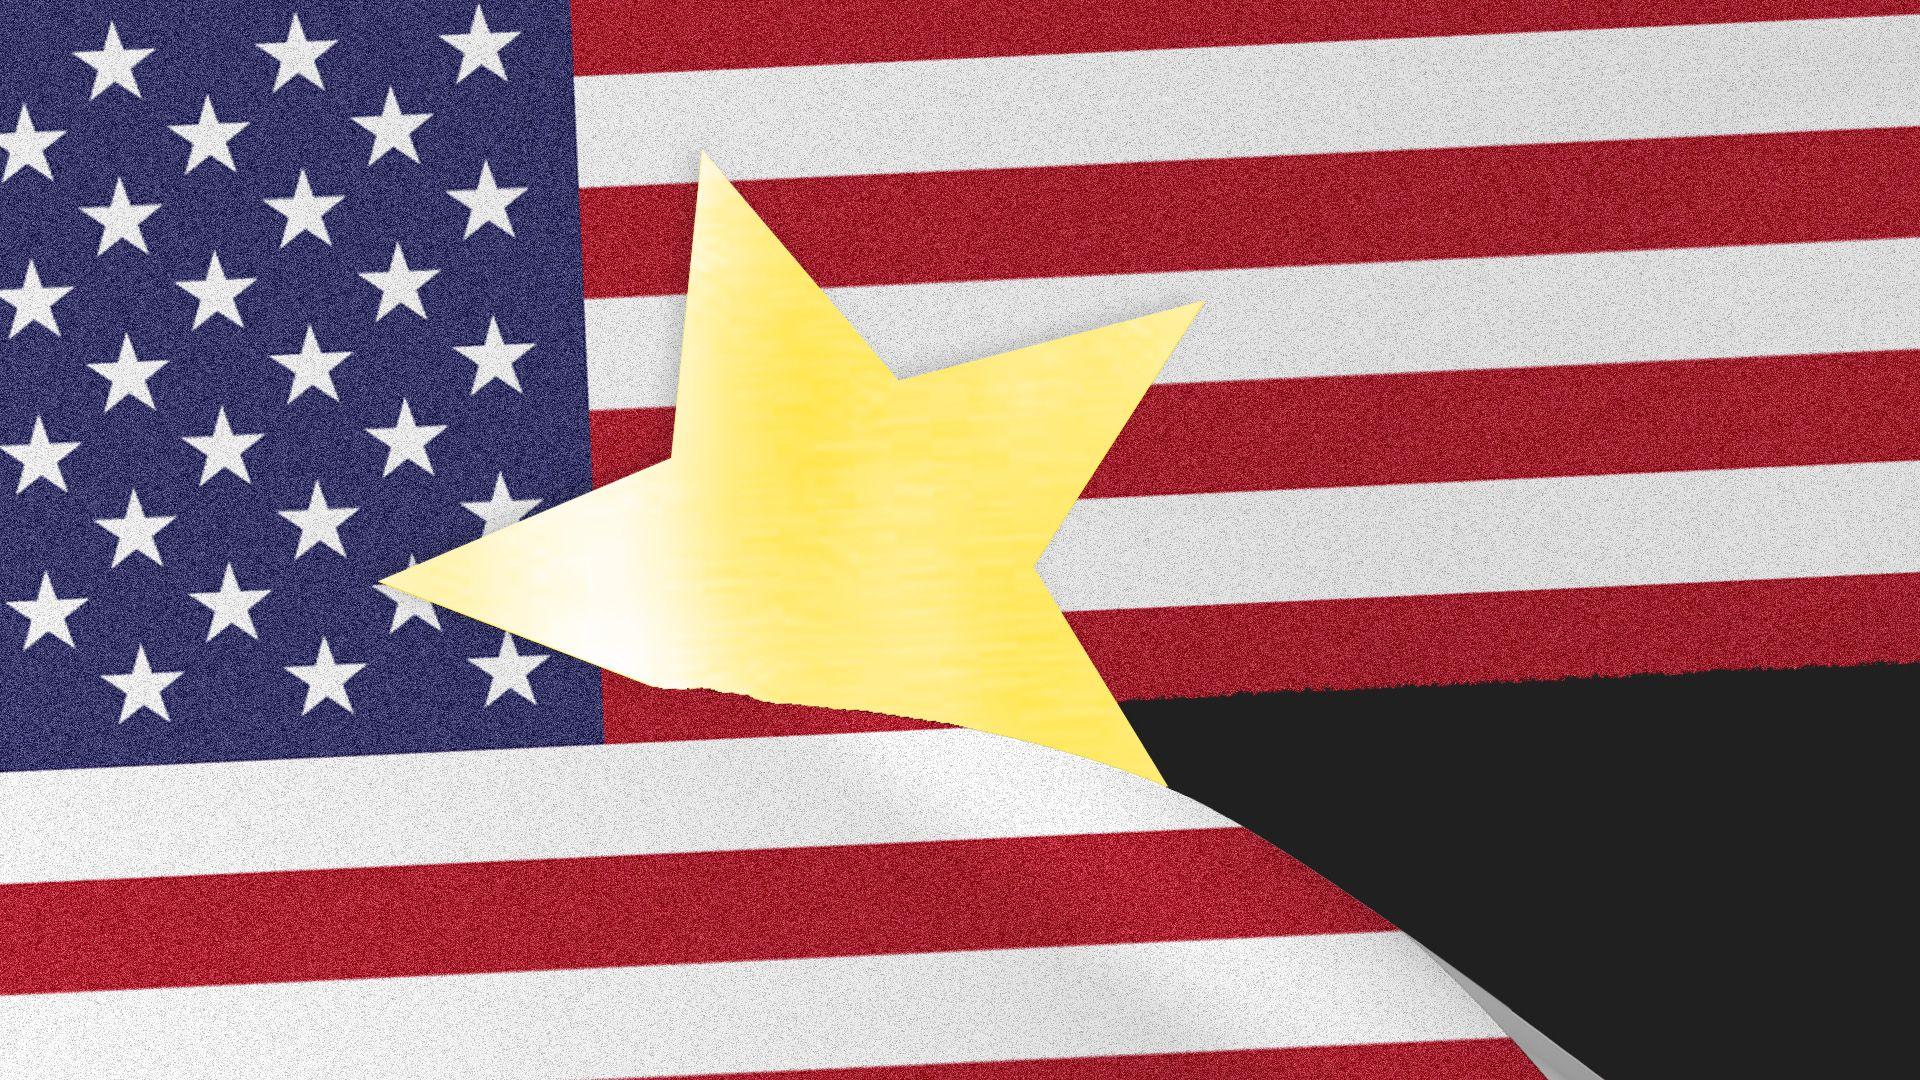 Illustration of Chinese star slicing through U.S. flag